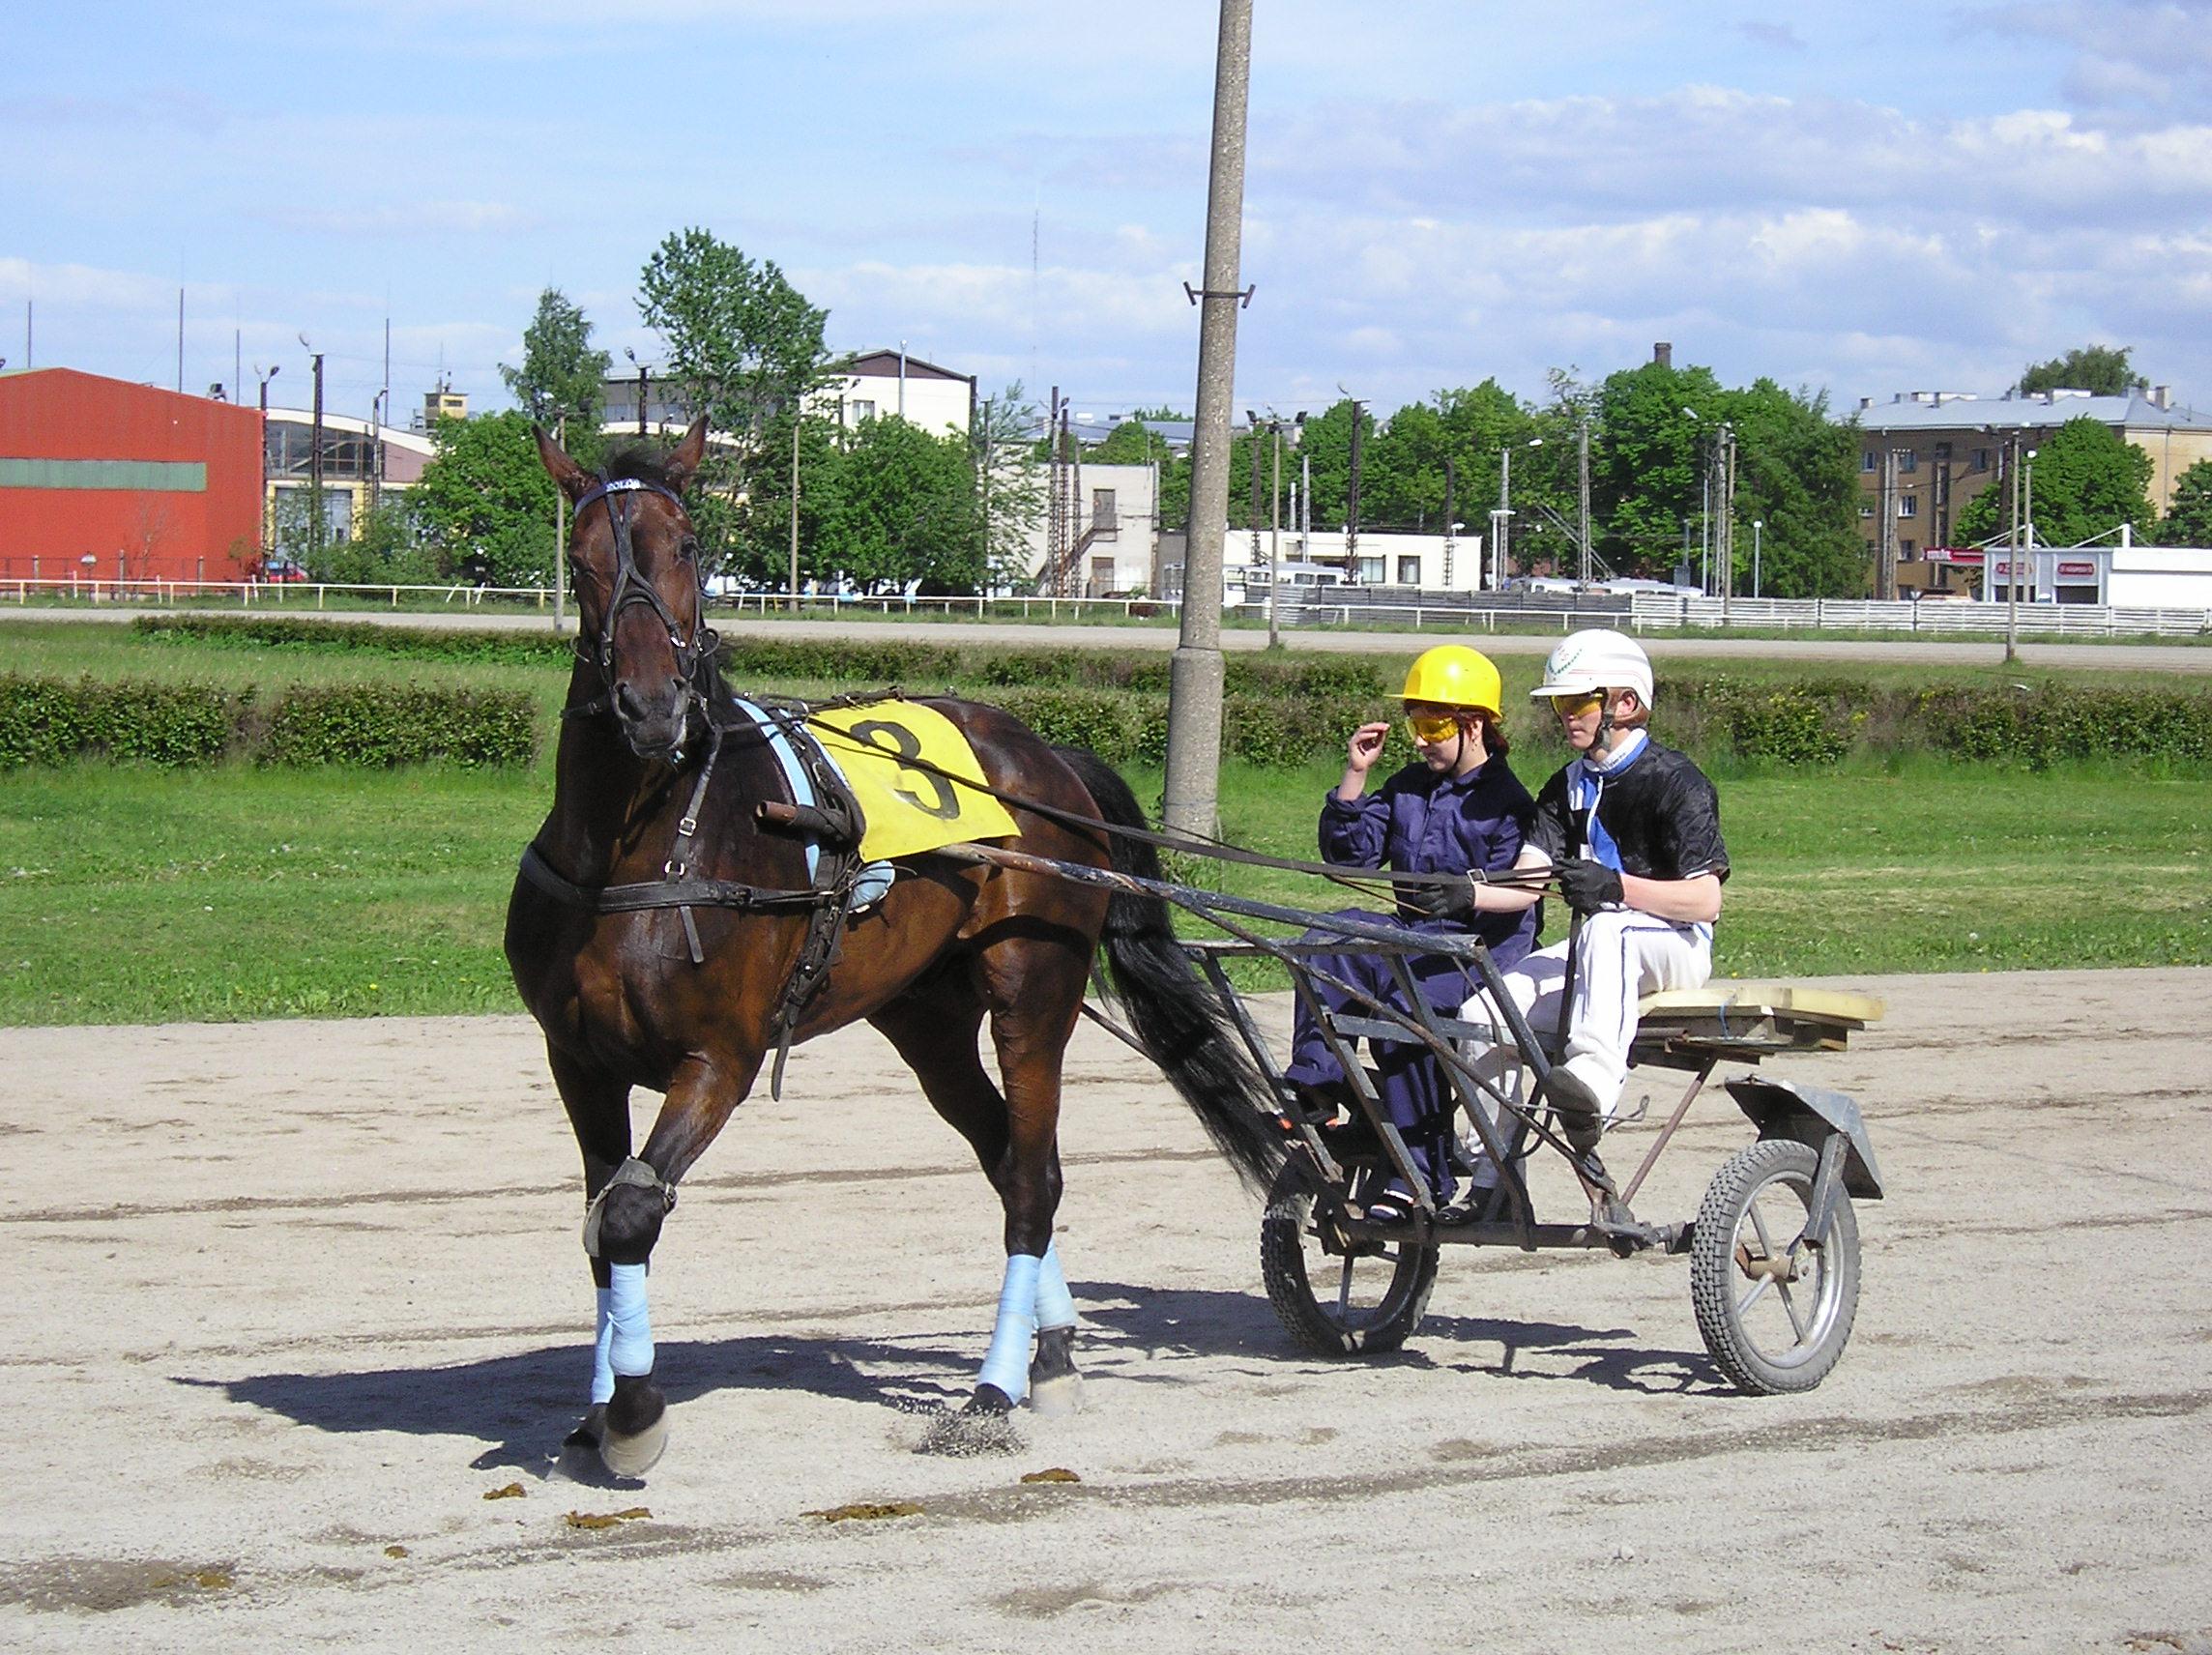 Private race day at the Tallinn Hippodrome